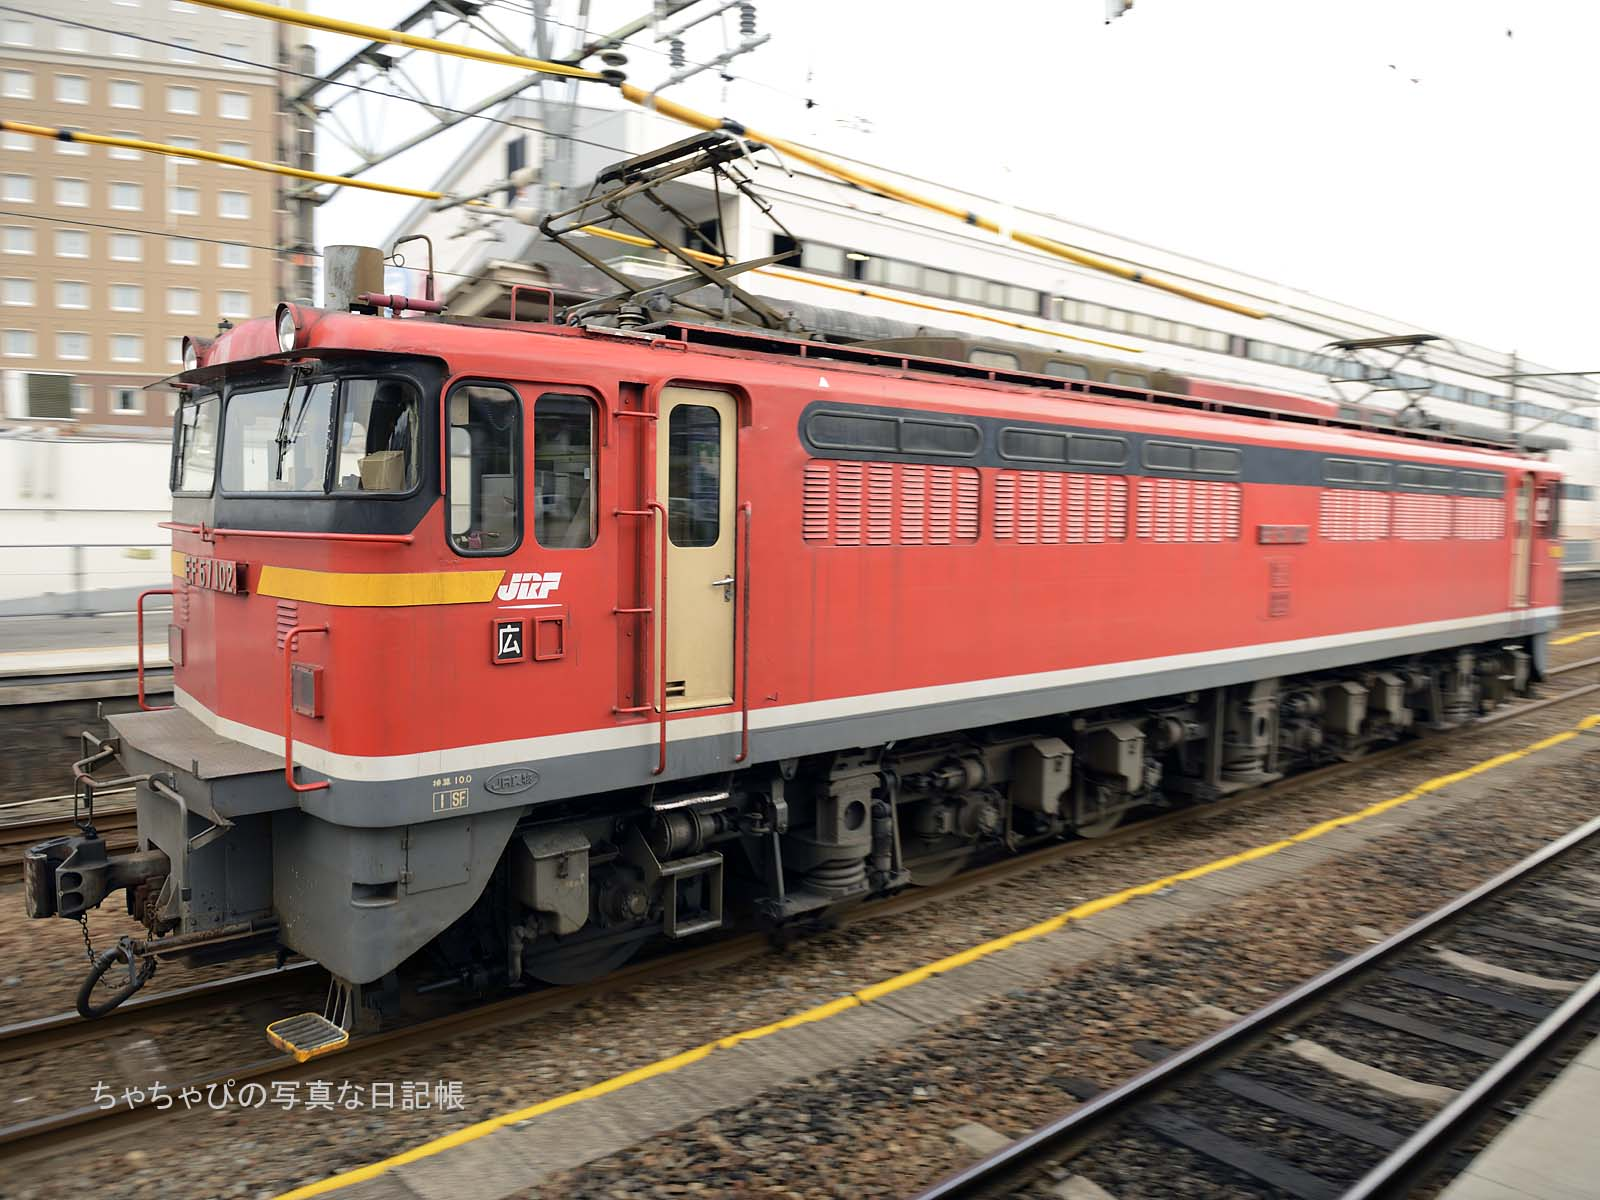 EF67-102